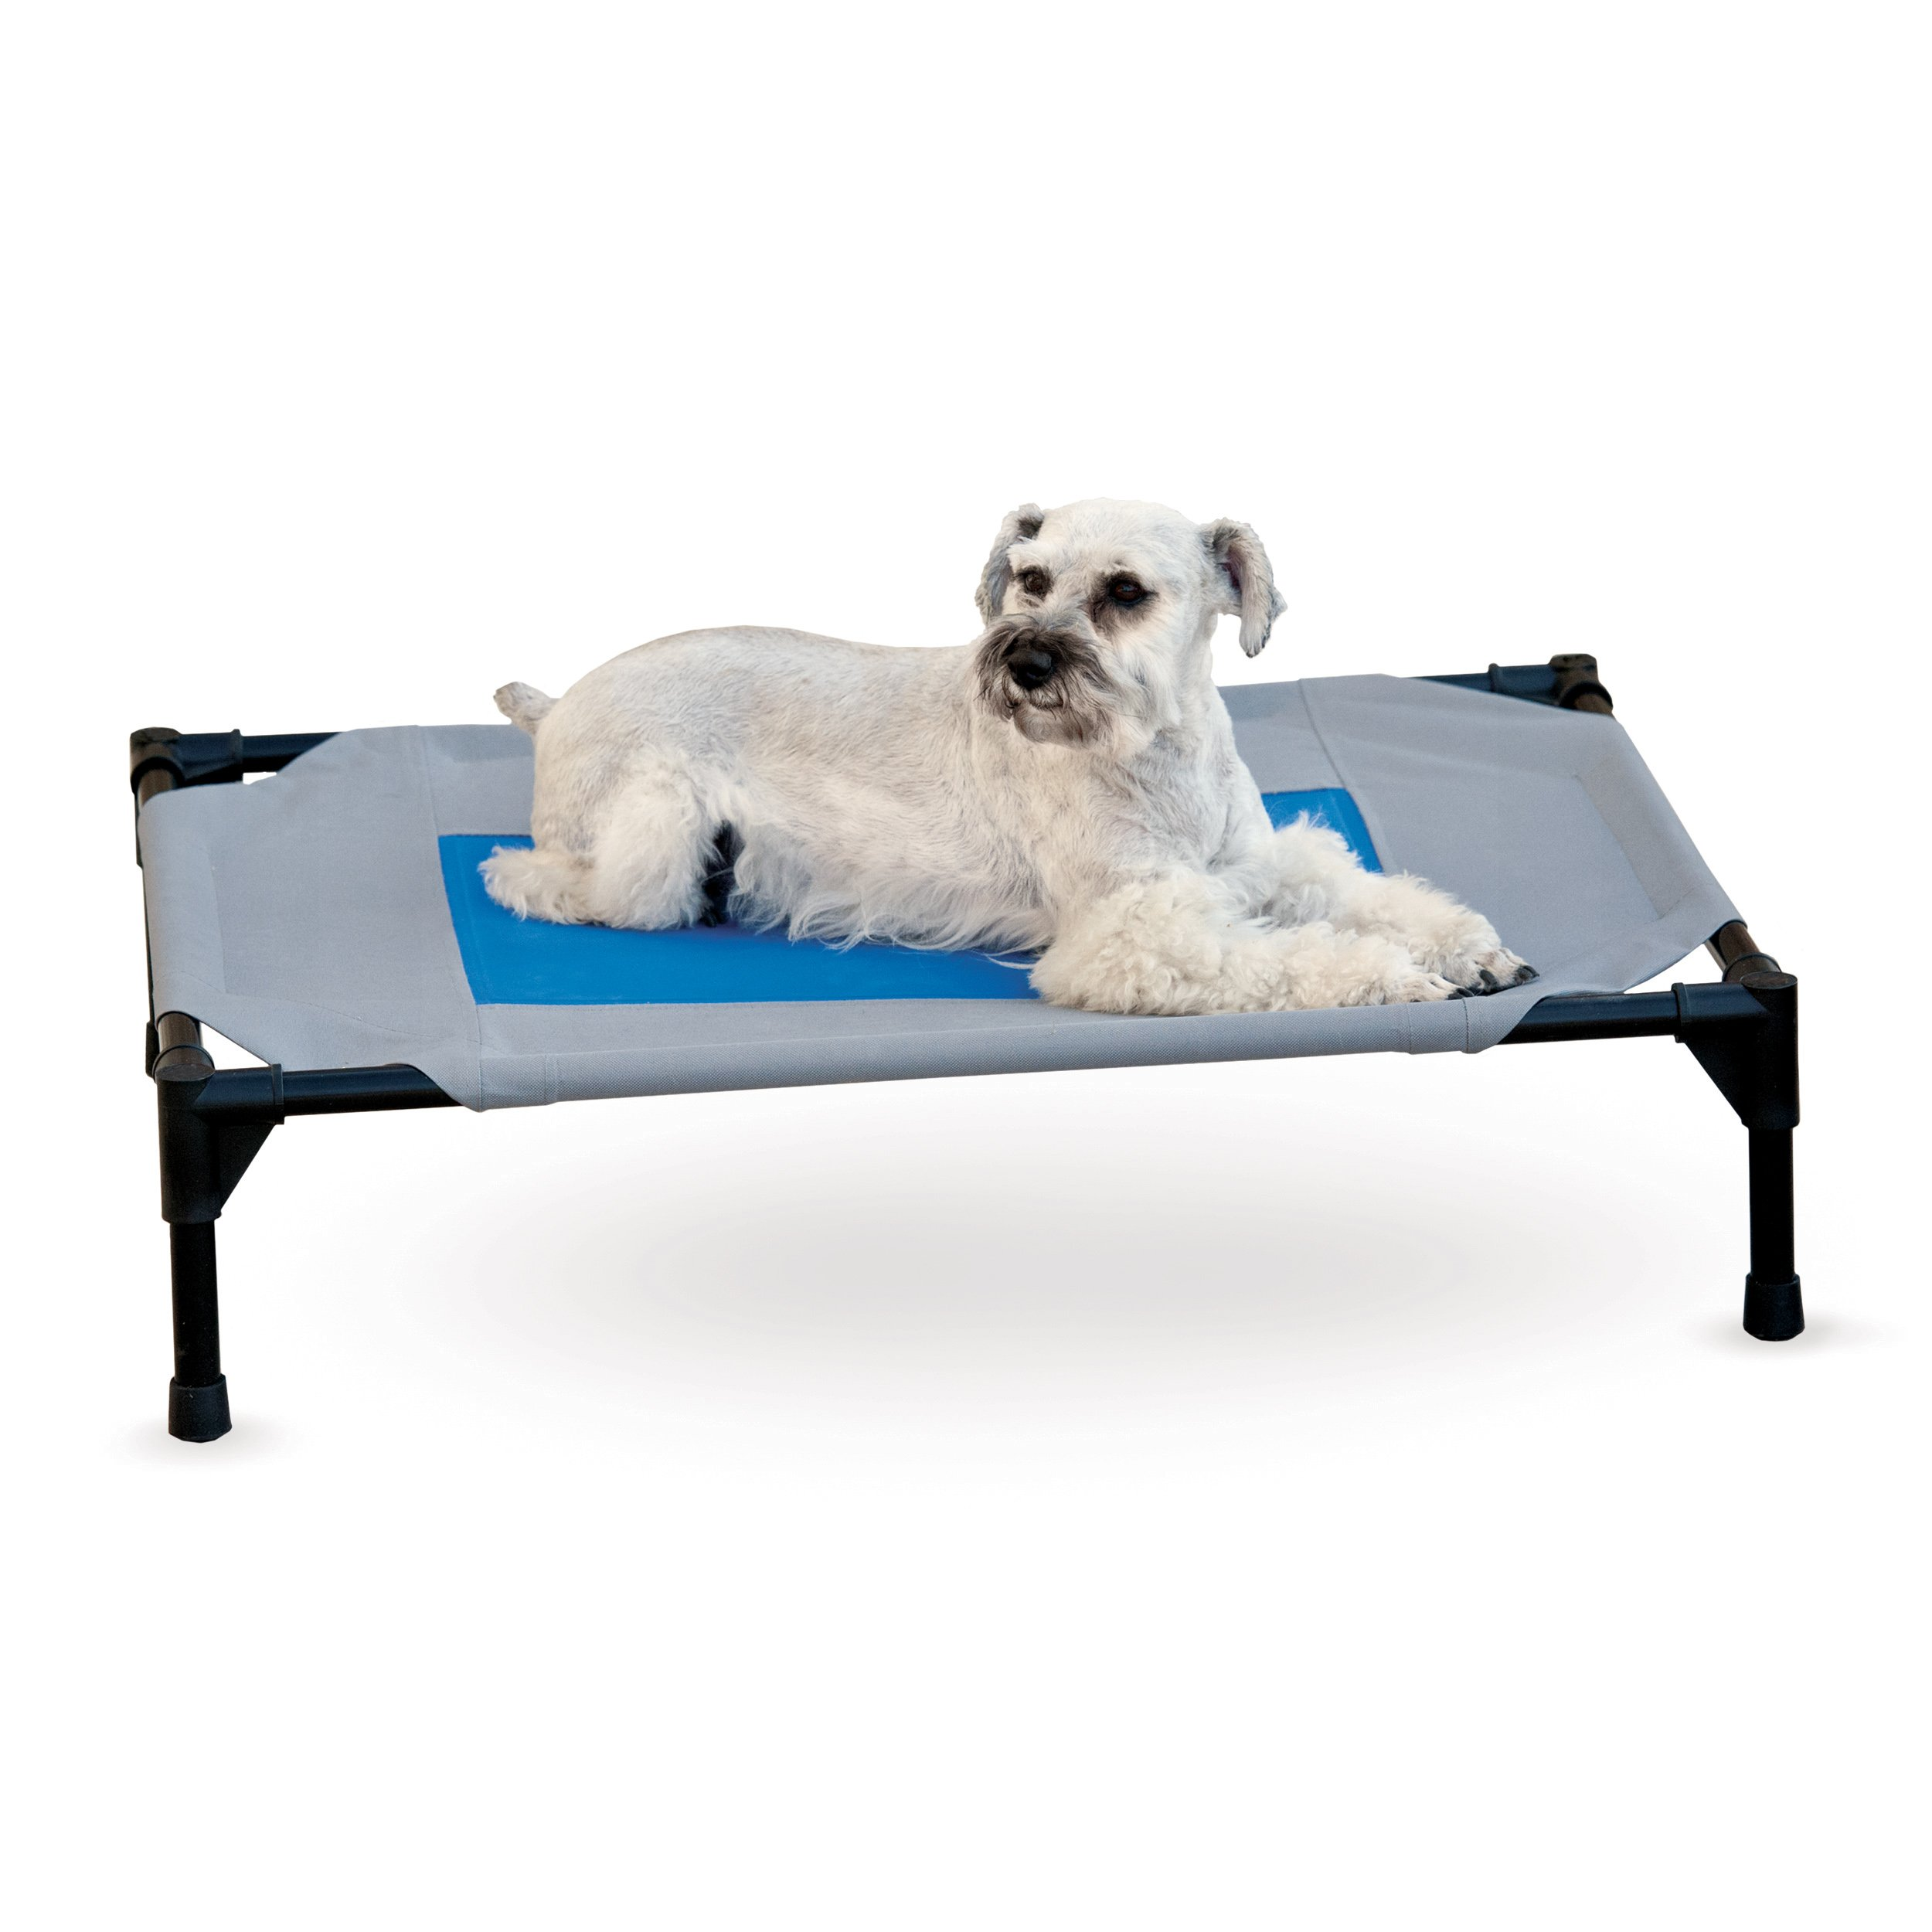 K&H Pet Products Coolin' Pet Cot Elevated Pet Bed Medium Gray/Blue 25'' x 32'' x 7''